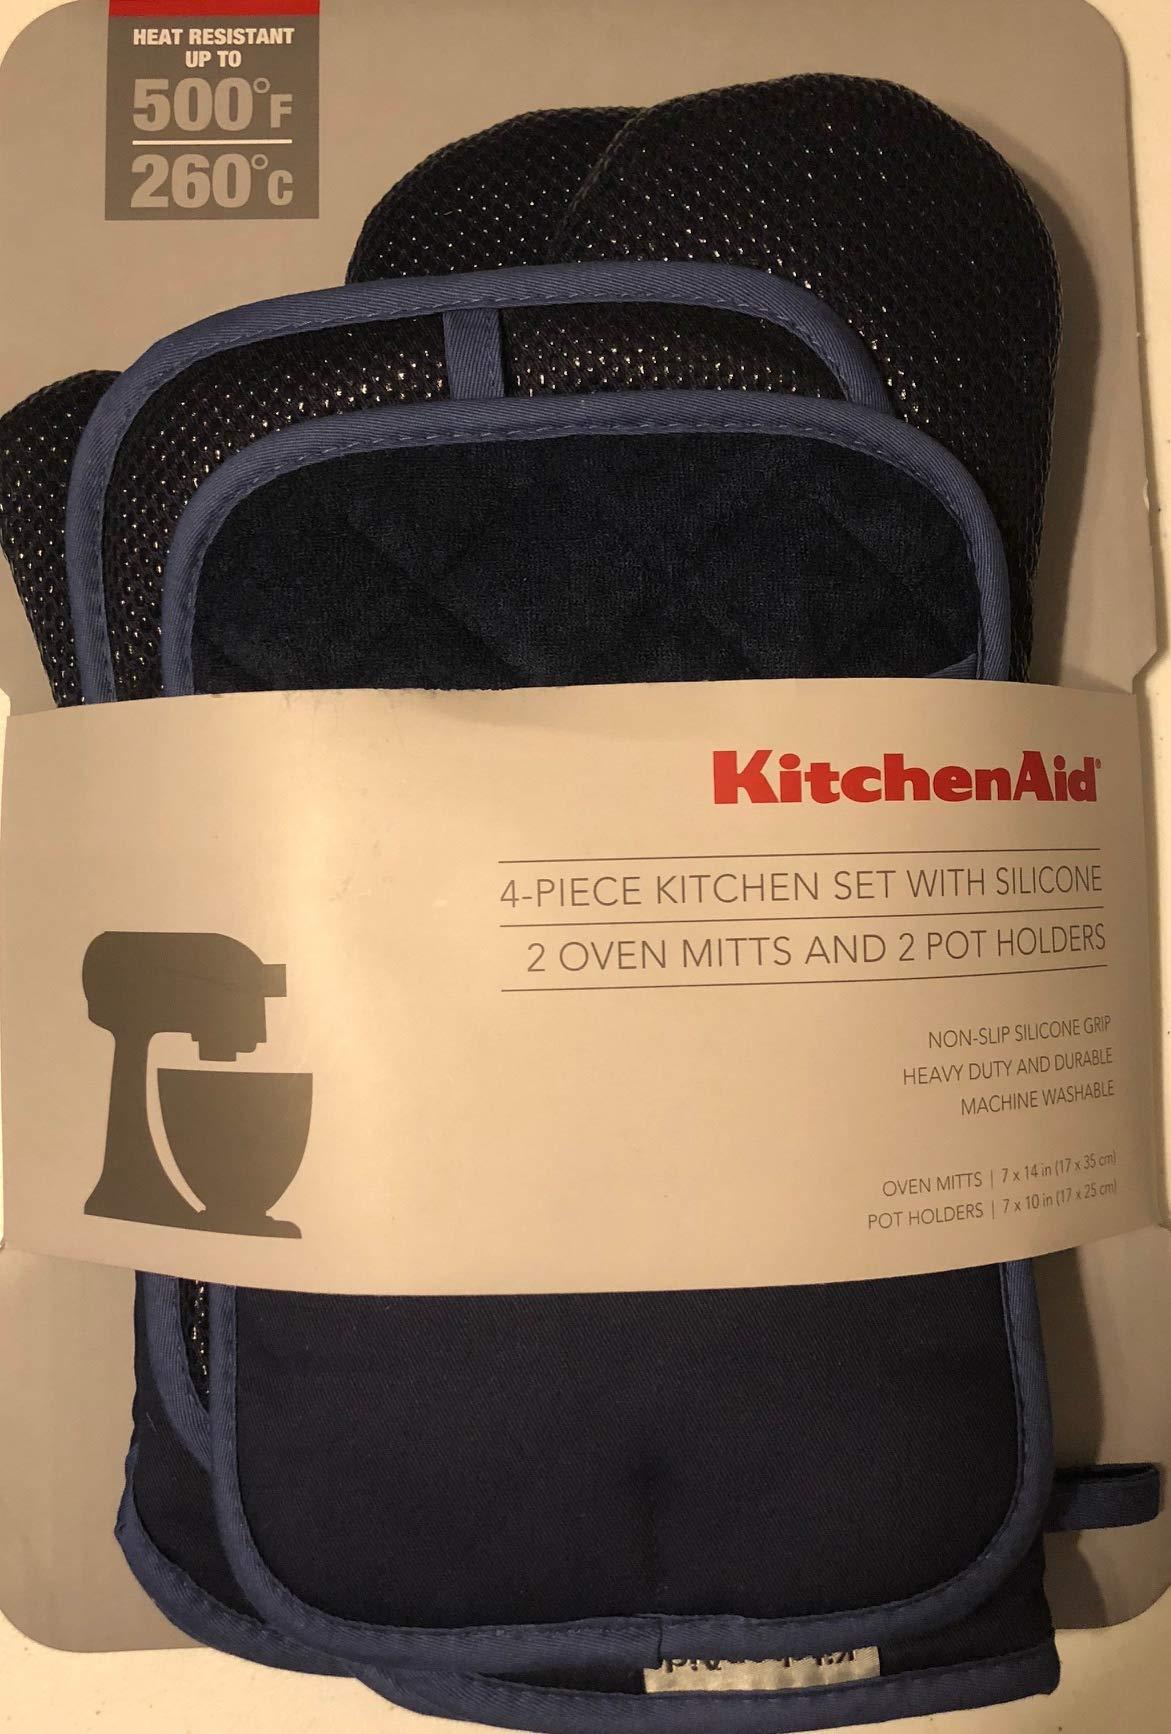 KitchenAid 4 Piece Kitchen Set w/Silicone 2 Oven Mitts, 2 Pot Holders (Blue) by KitchenAid